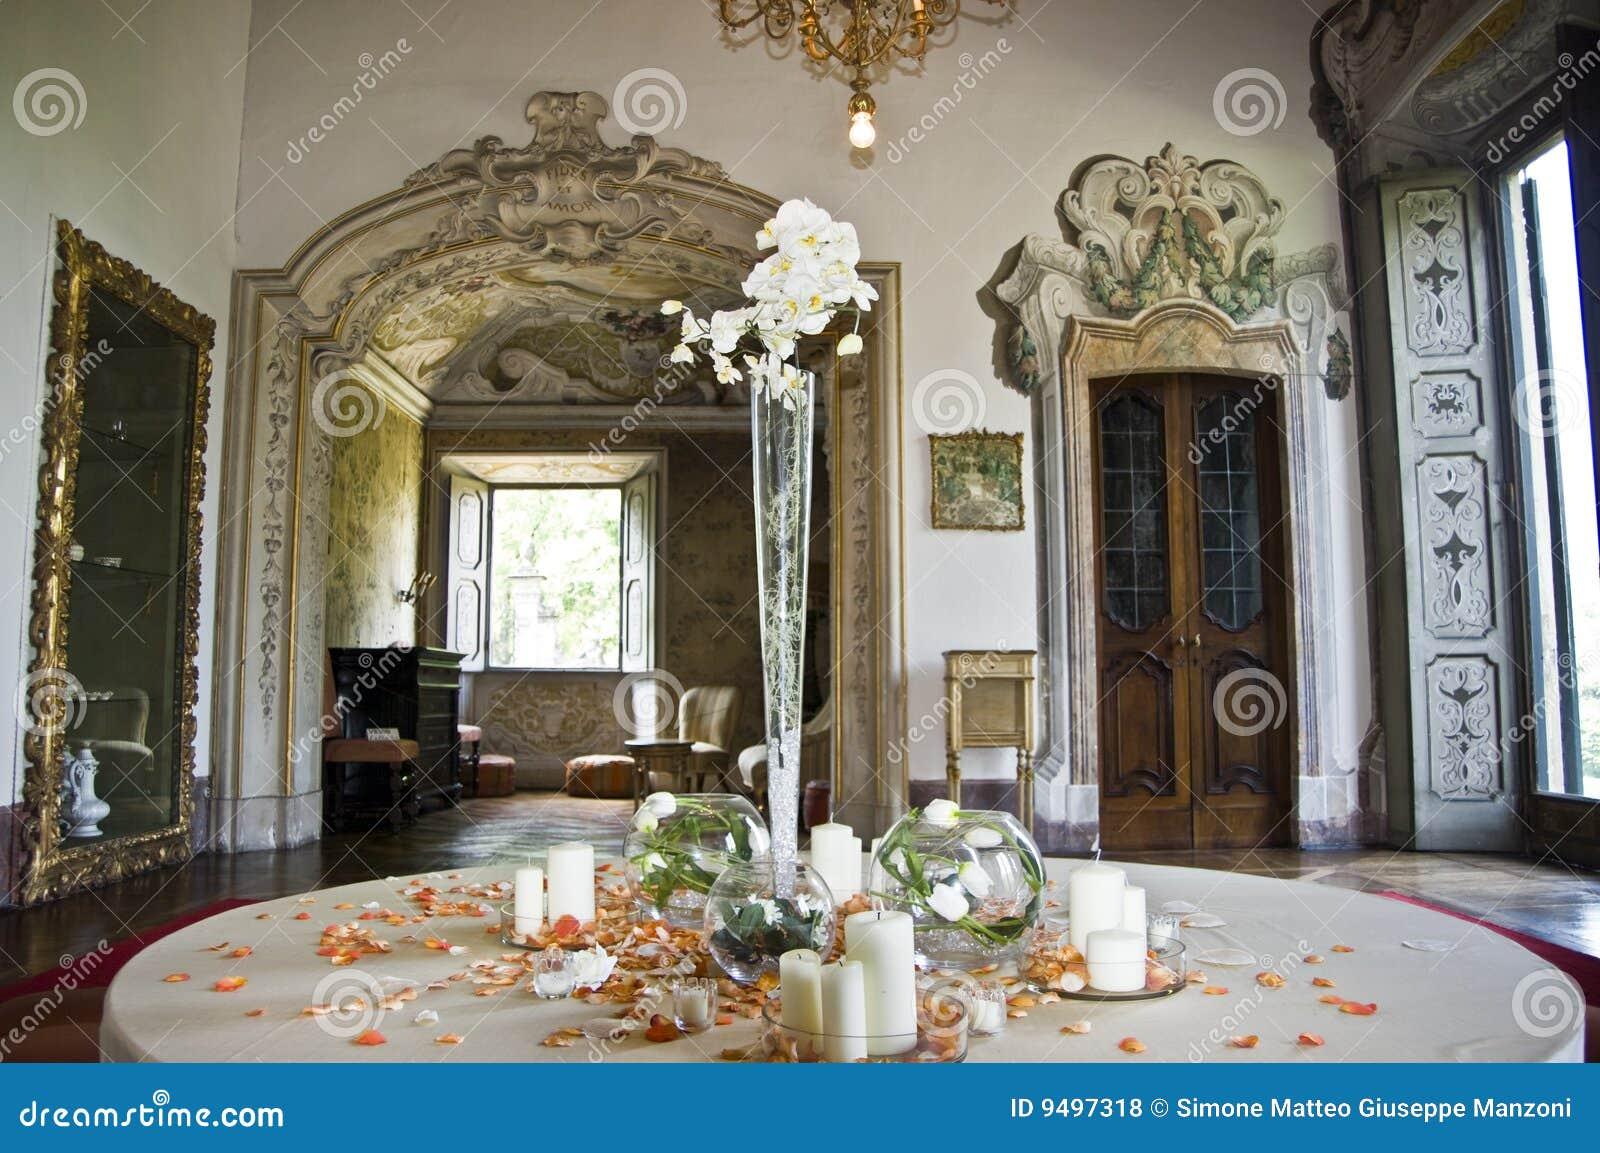 Neoclassic interior royalty free stock photos image 9497318 for Italian villa interior design